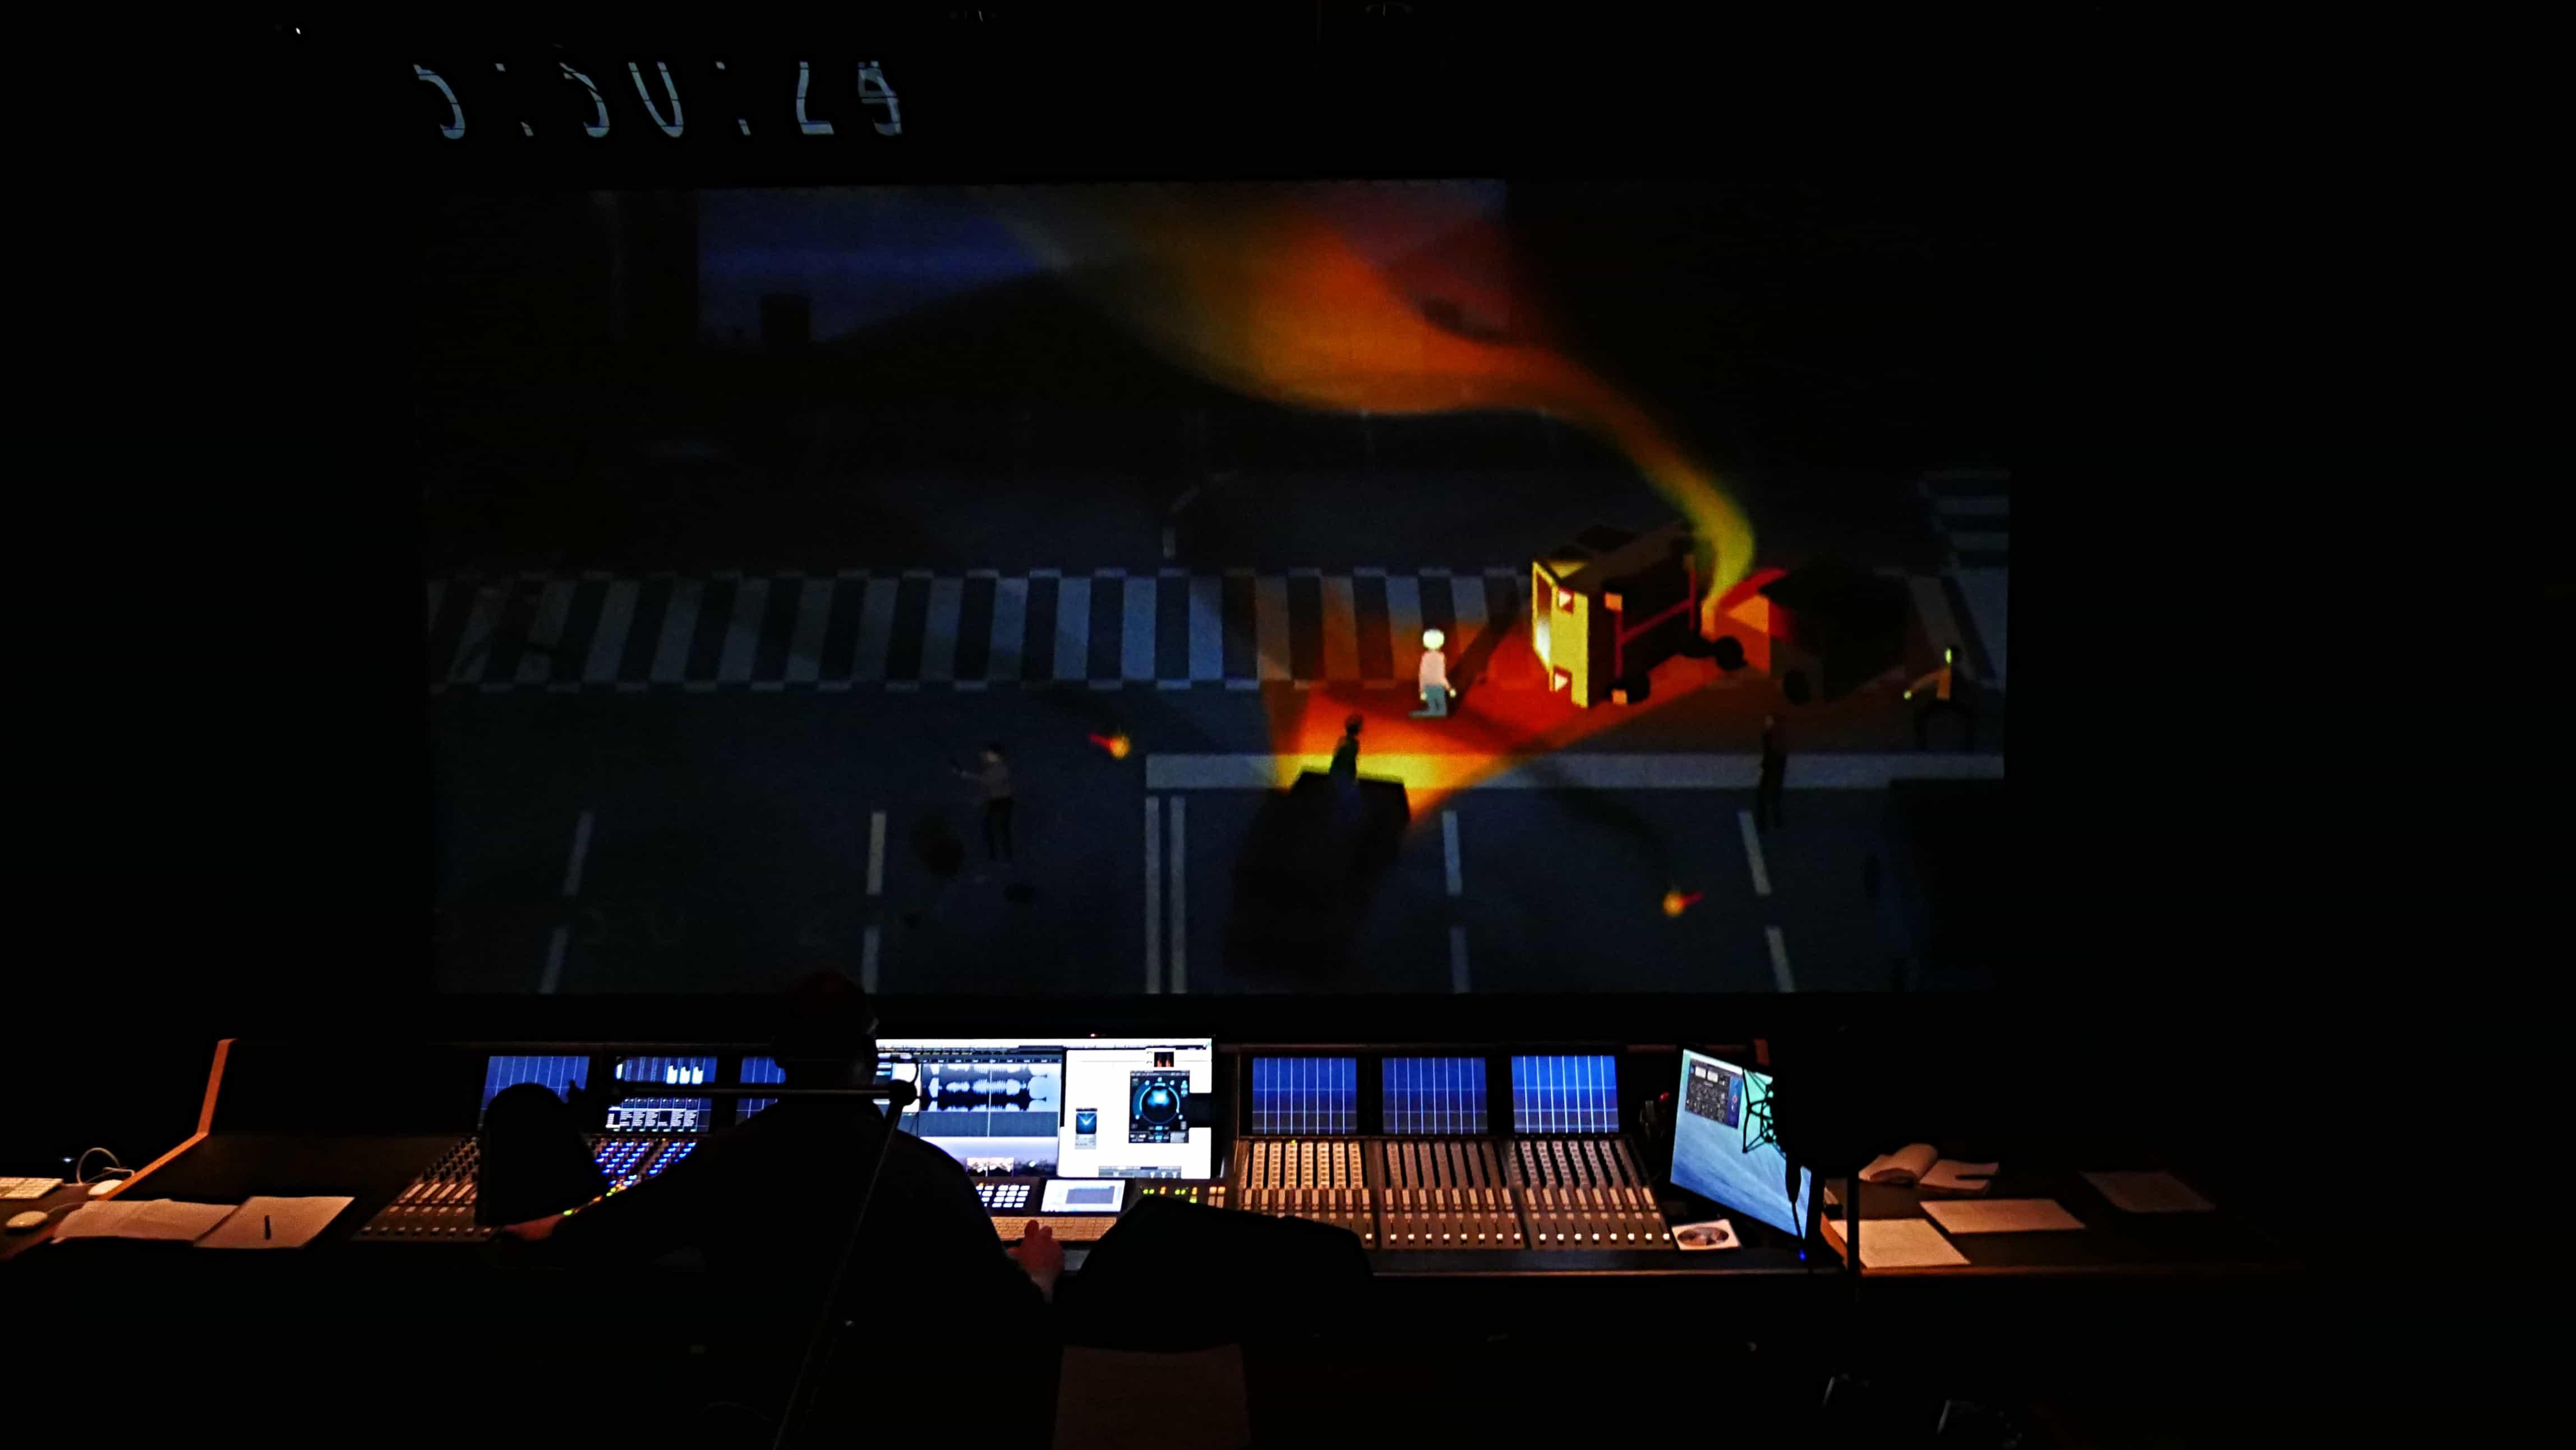 David Kamp cinema mix dolby mixing stage berlin